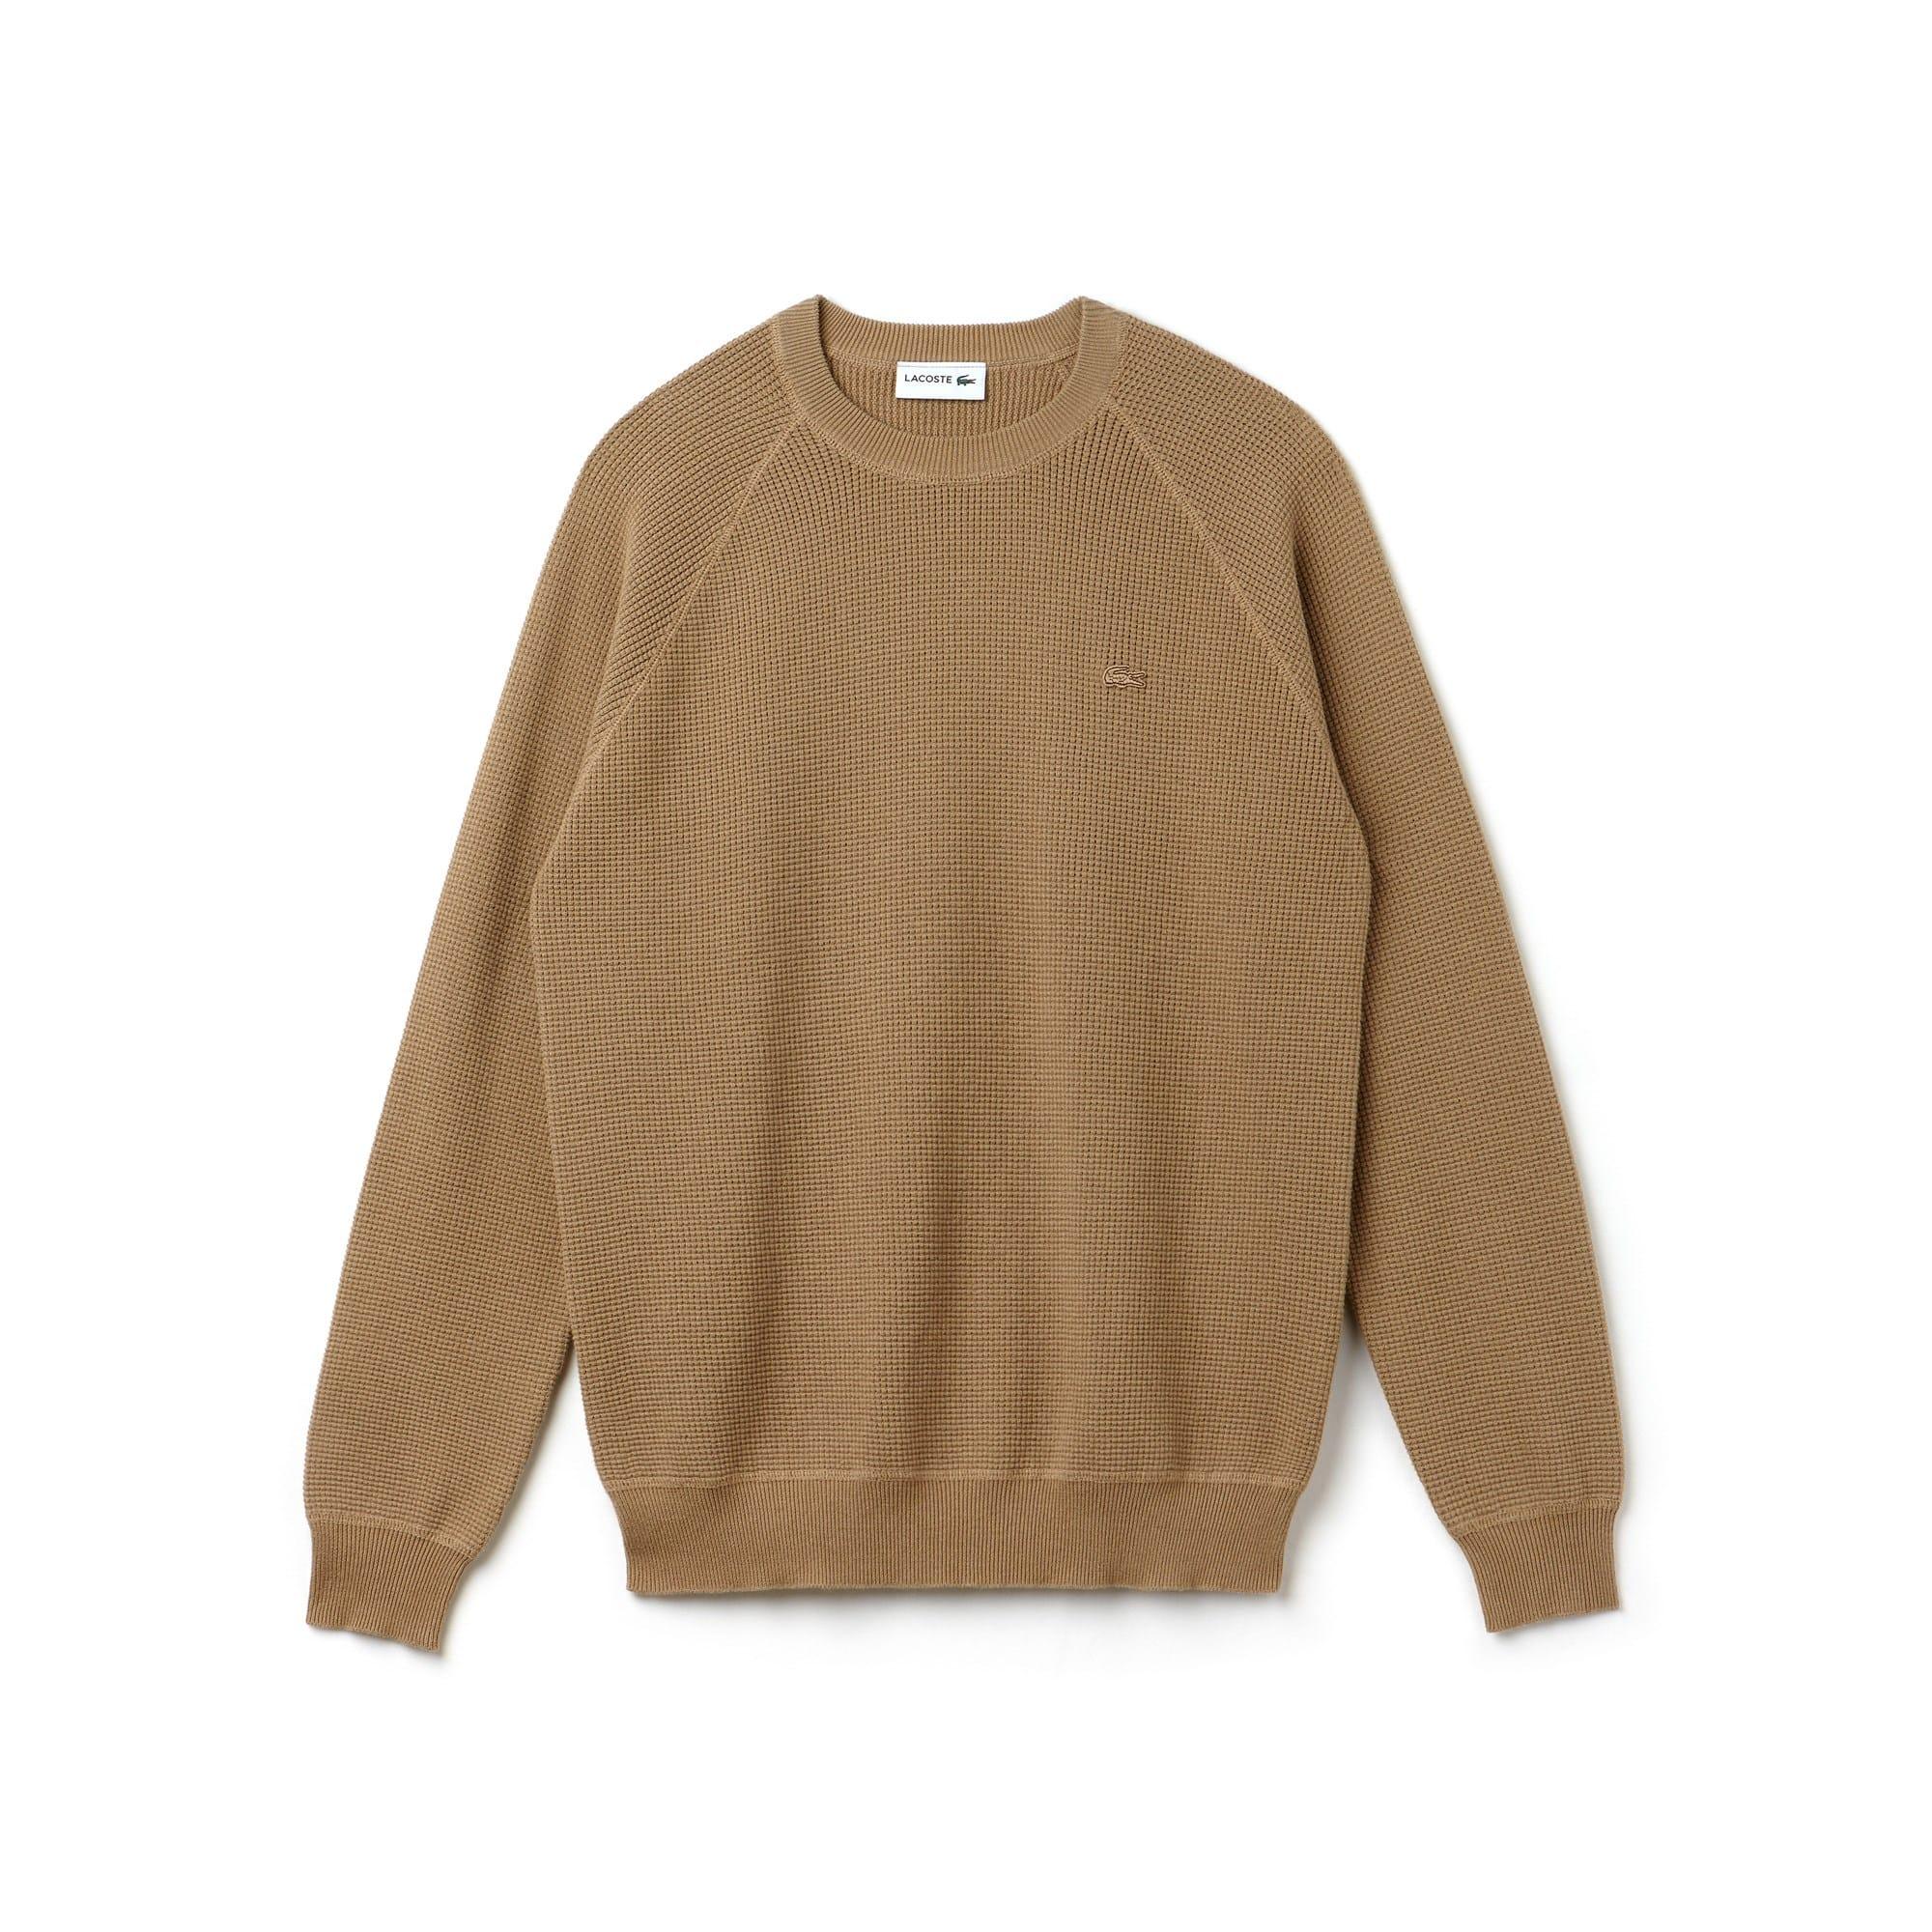 Sweater heren ronde hals honingraat katoencrêpe